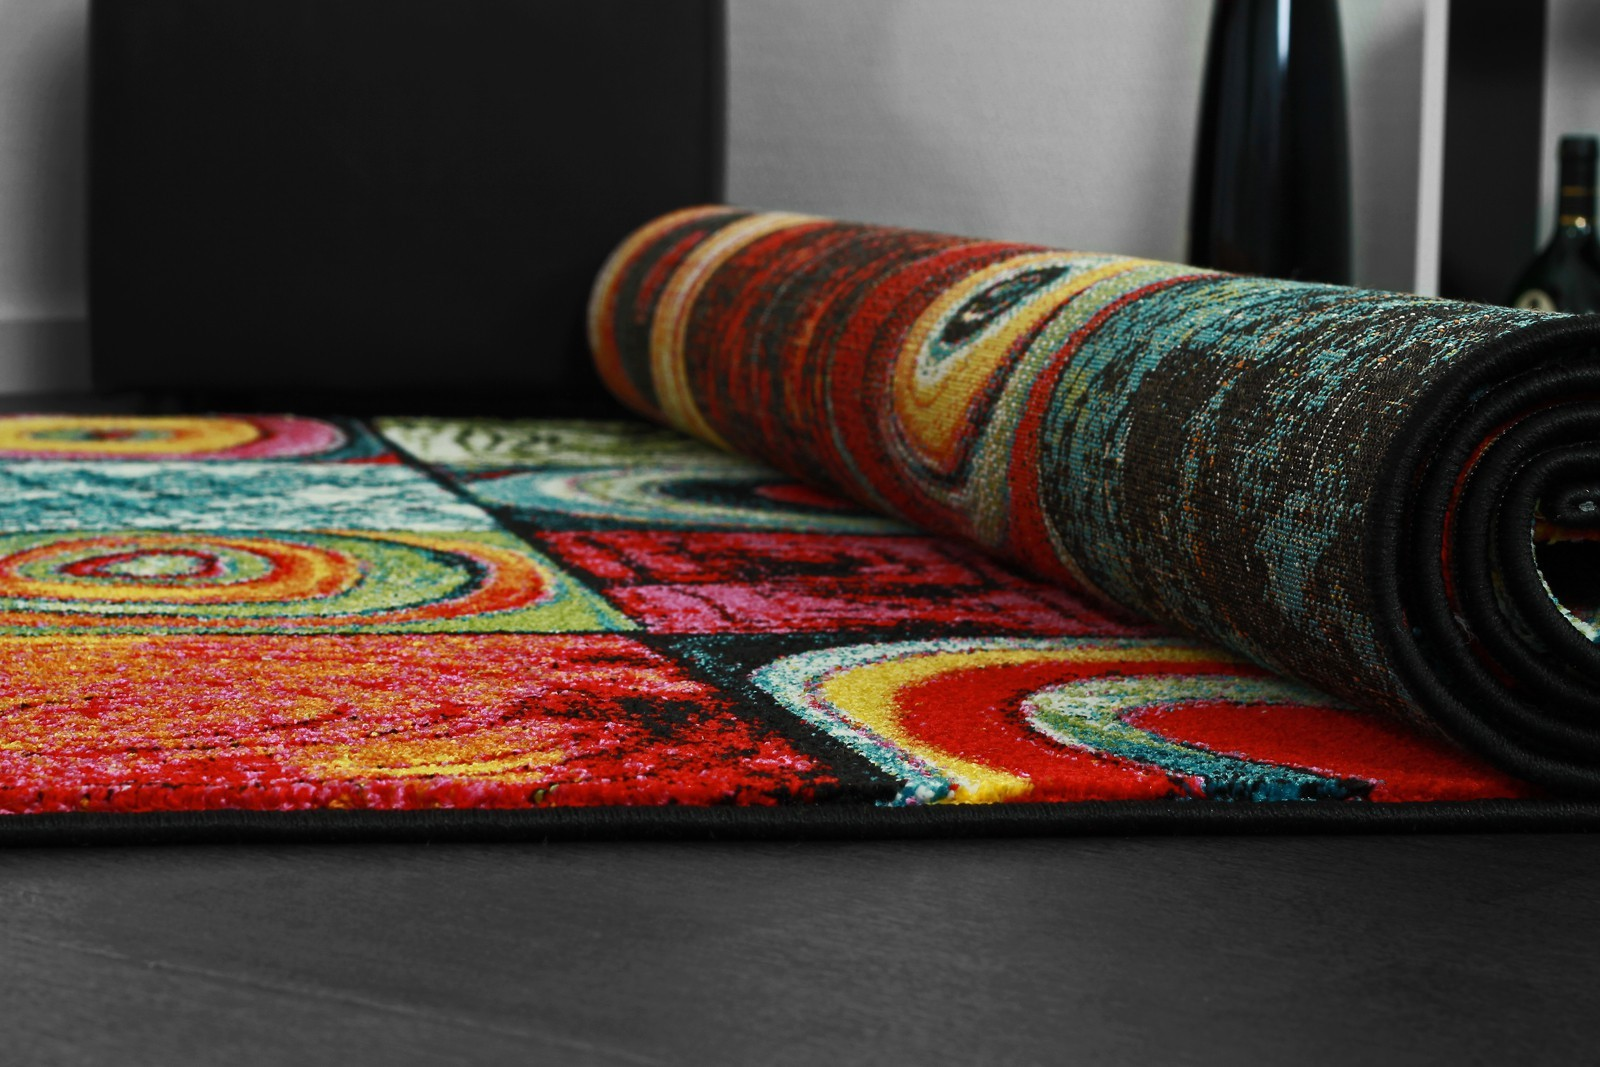 tapis multicolore tapis shaggy pas cher tapis oriental tapis salon pas cher - Tapis Multicolore